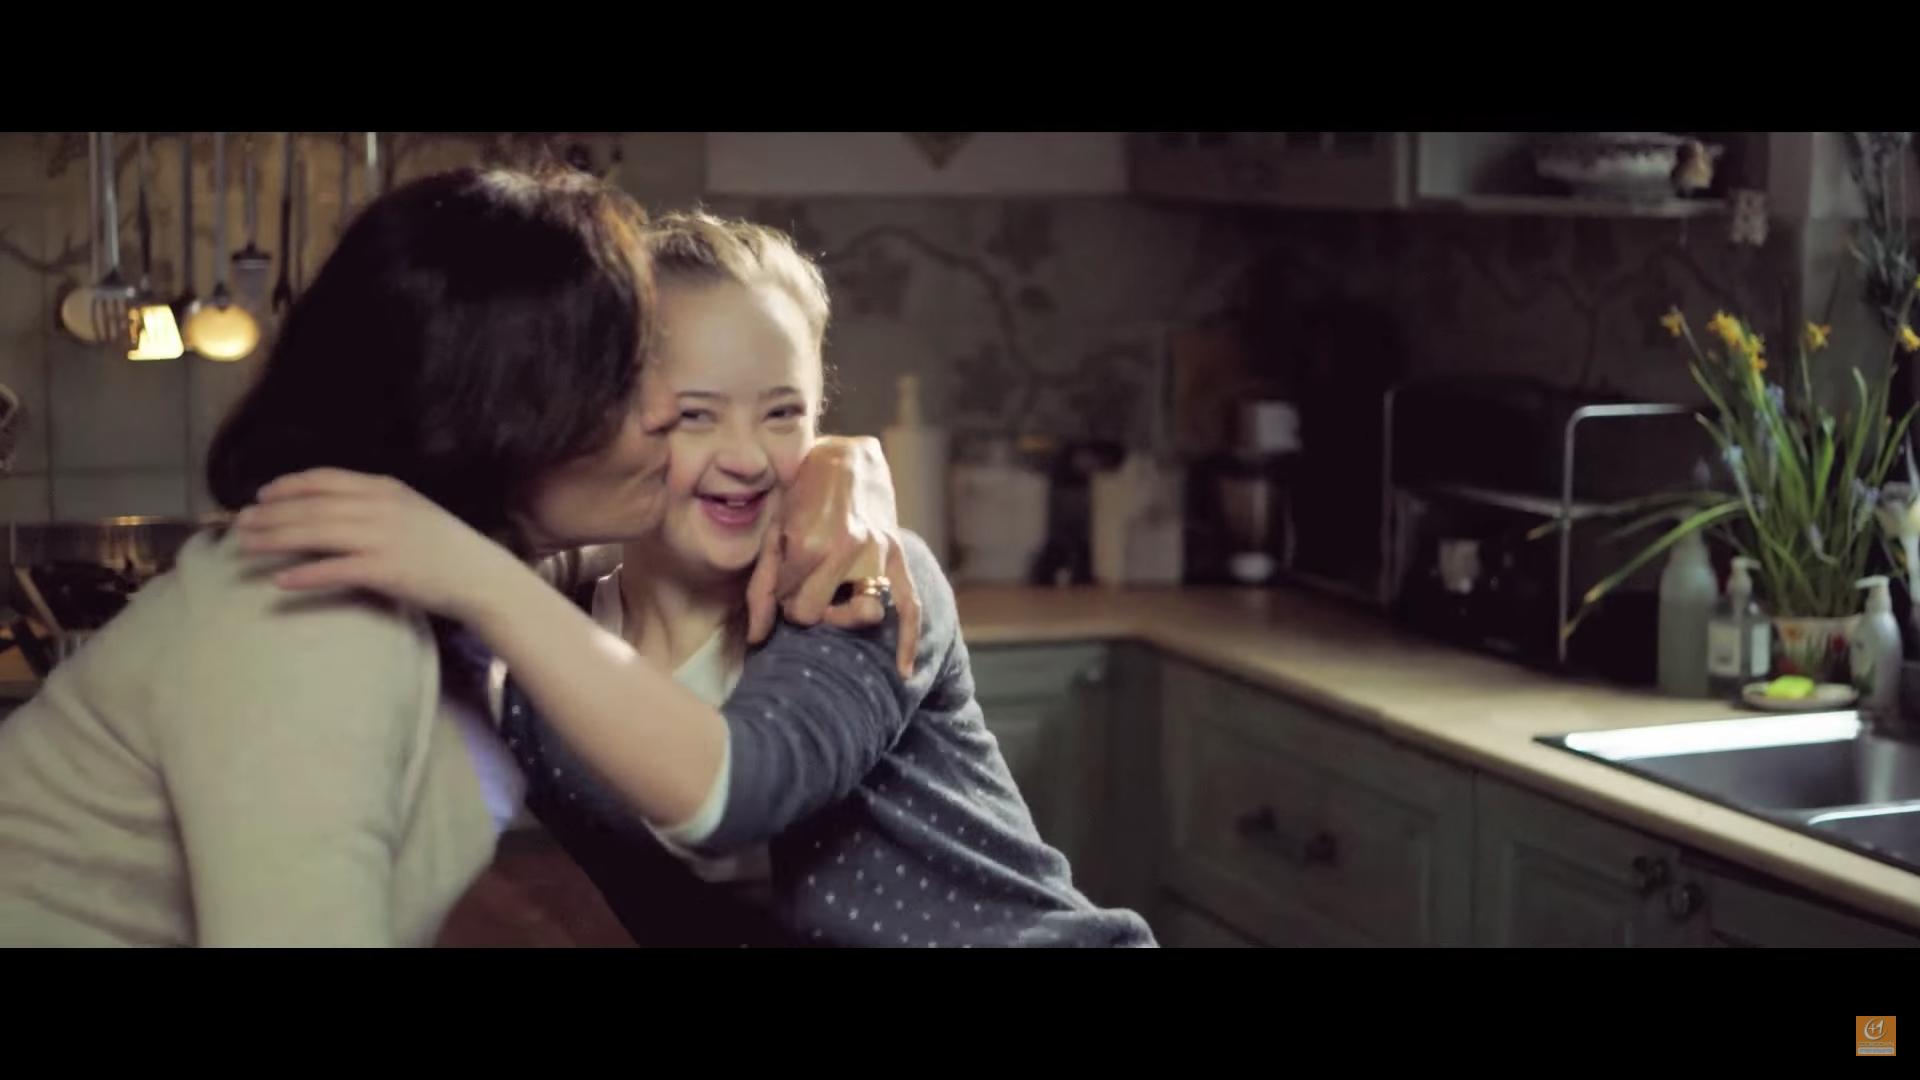 Capture vidéo @World Down Syndrome Day | #DearFutureMom